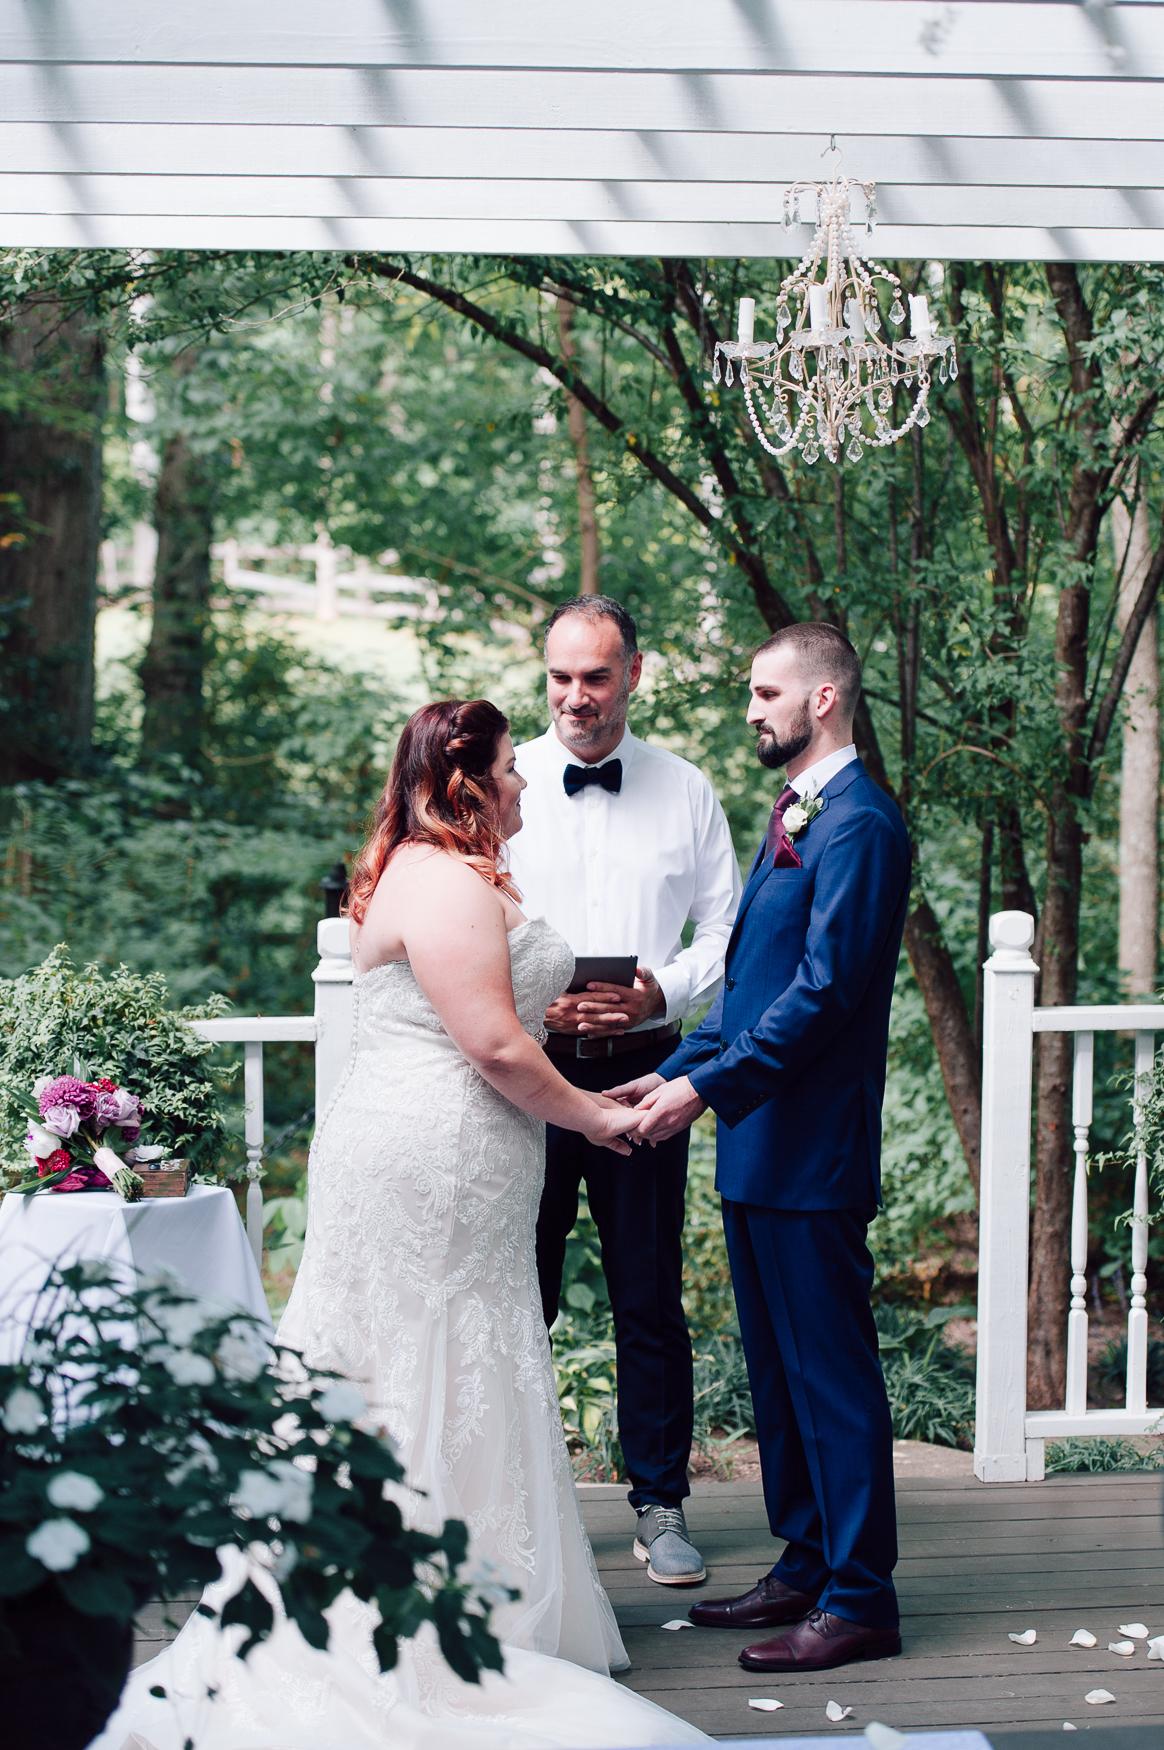 virginiawedding_GlenGarden_rusticwedding_fredericksburg_youseephotography_KellySteven (32).jpg